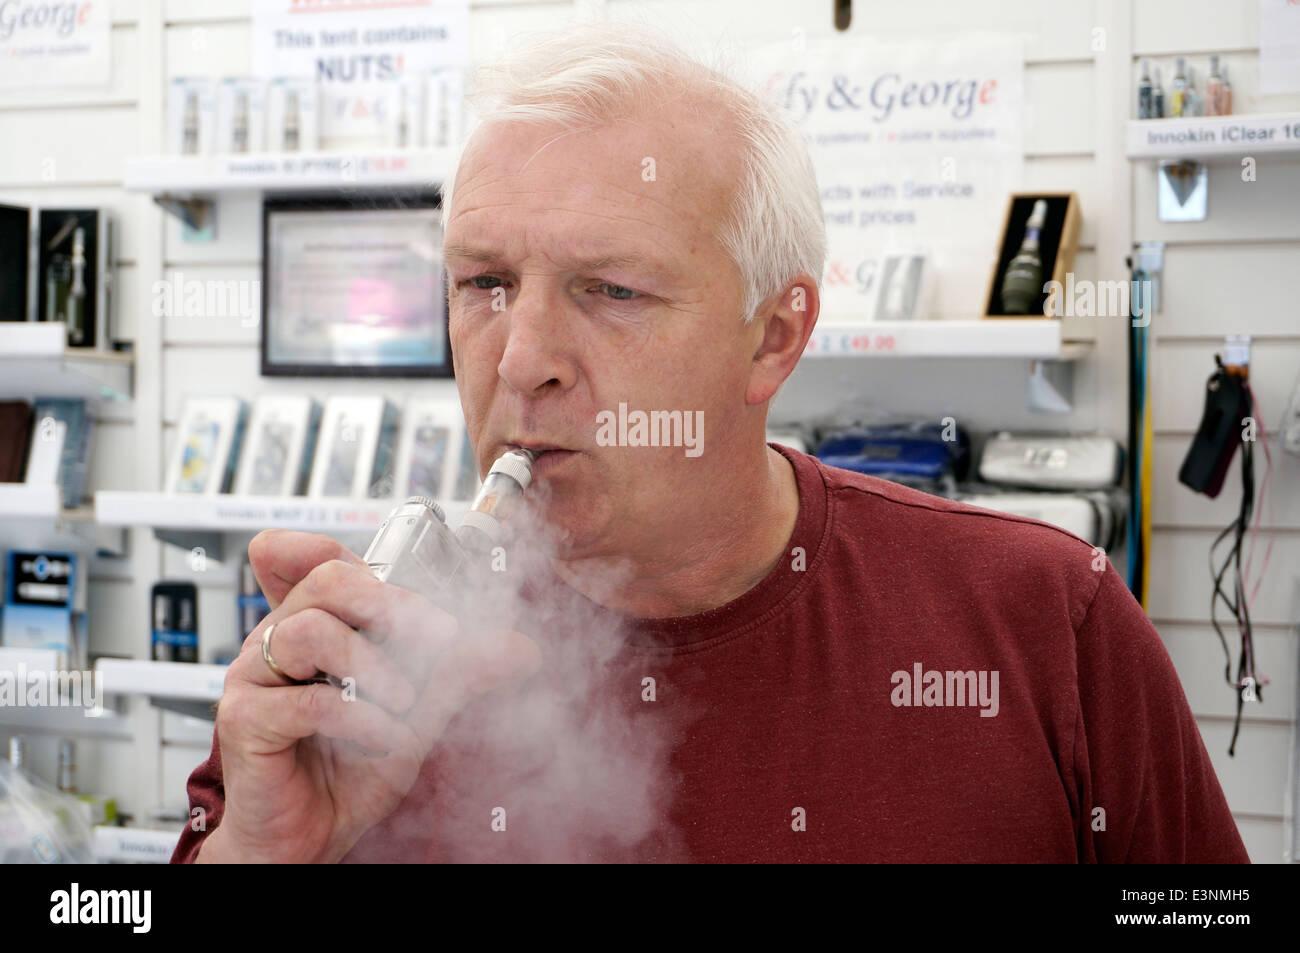 Man smoking an Electronic E Cigarette (e-cigarette) to help stop smoking ordinary tobacco - Stock Image